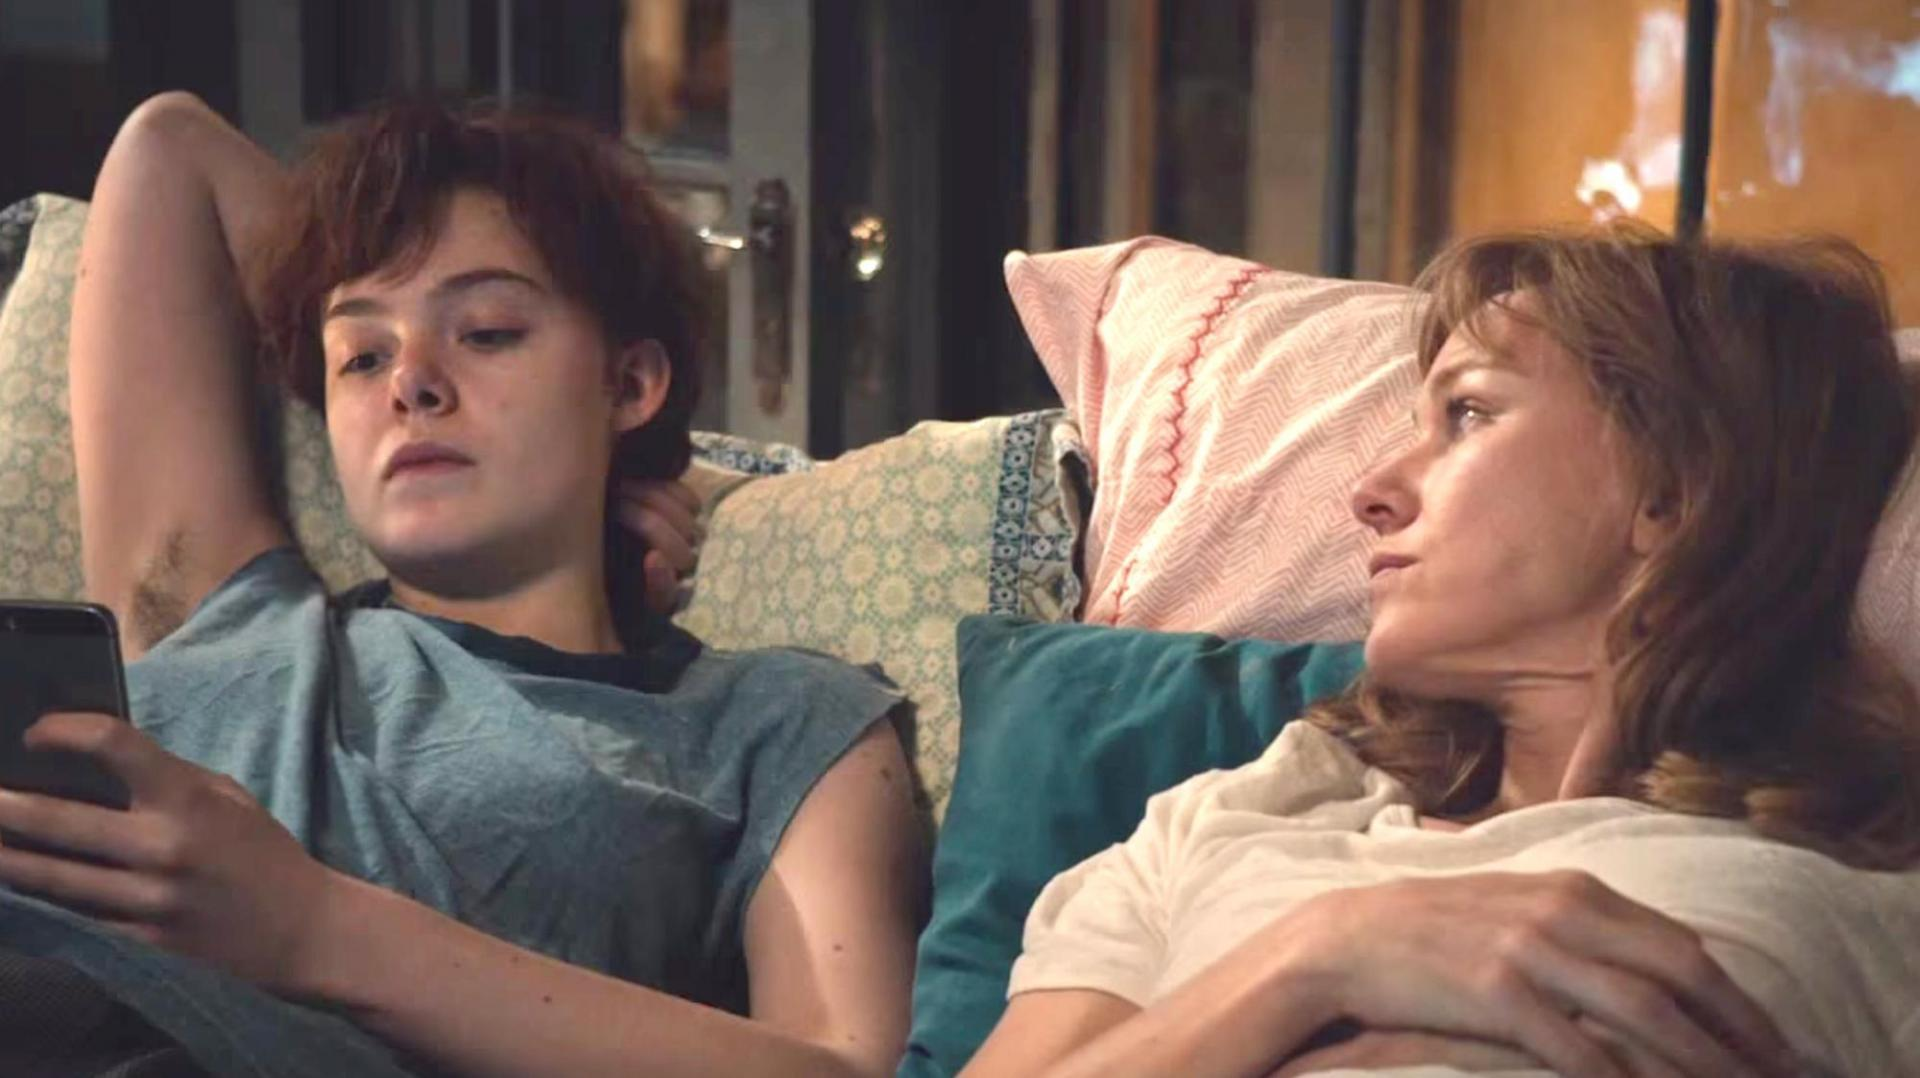 Conociendo a Ray (2015) - Filmaffinity